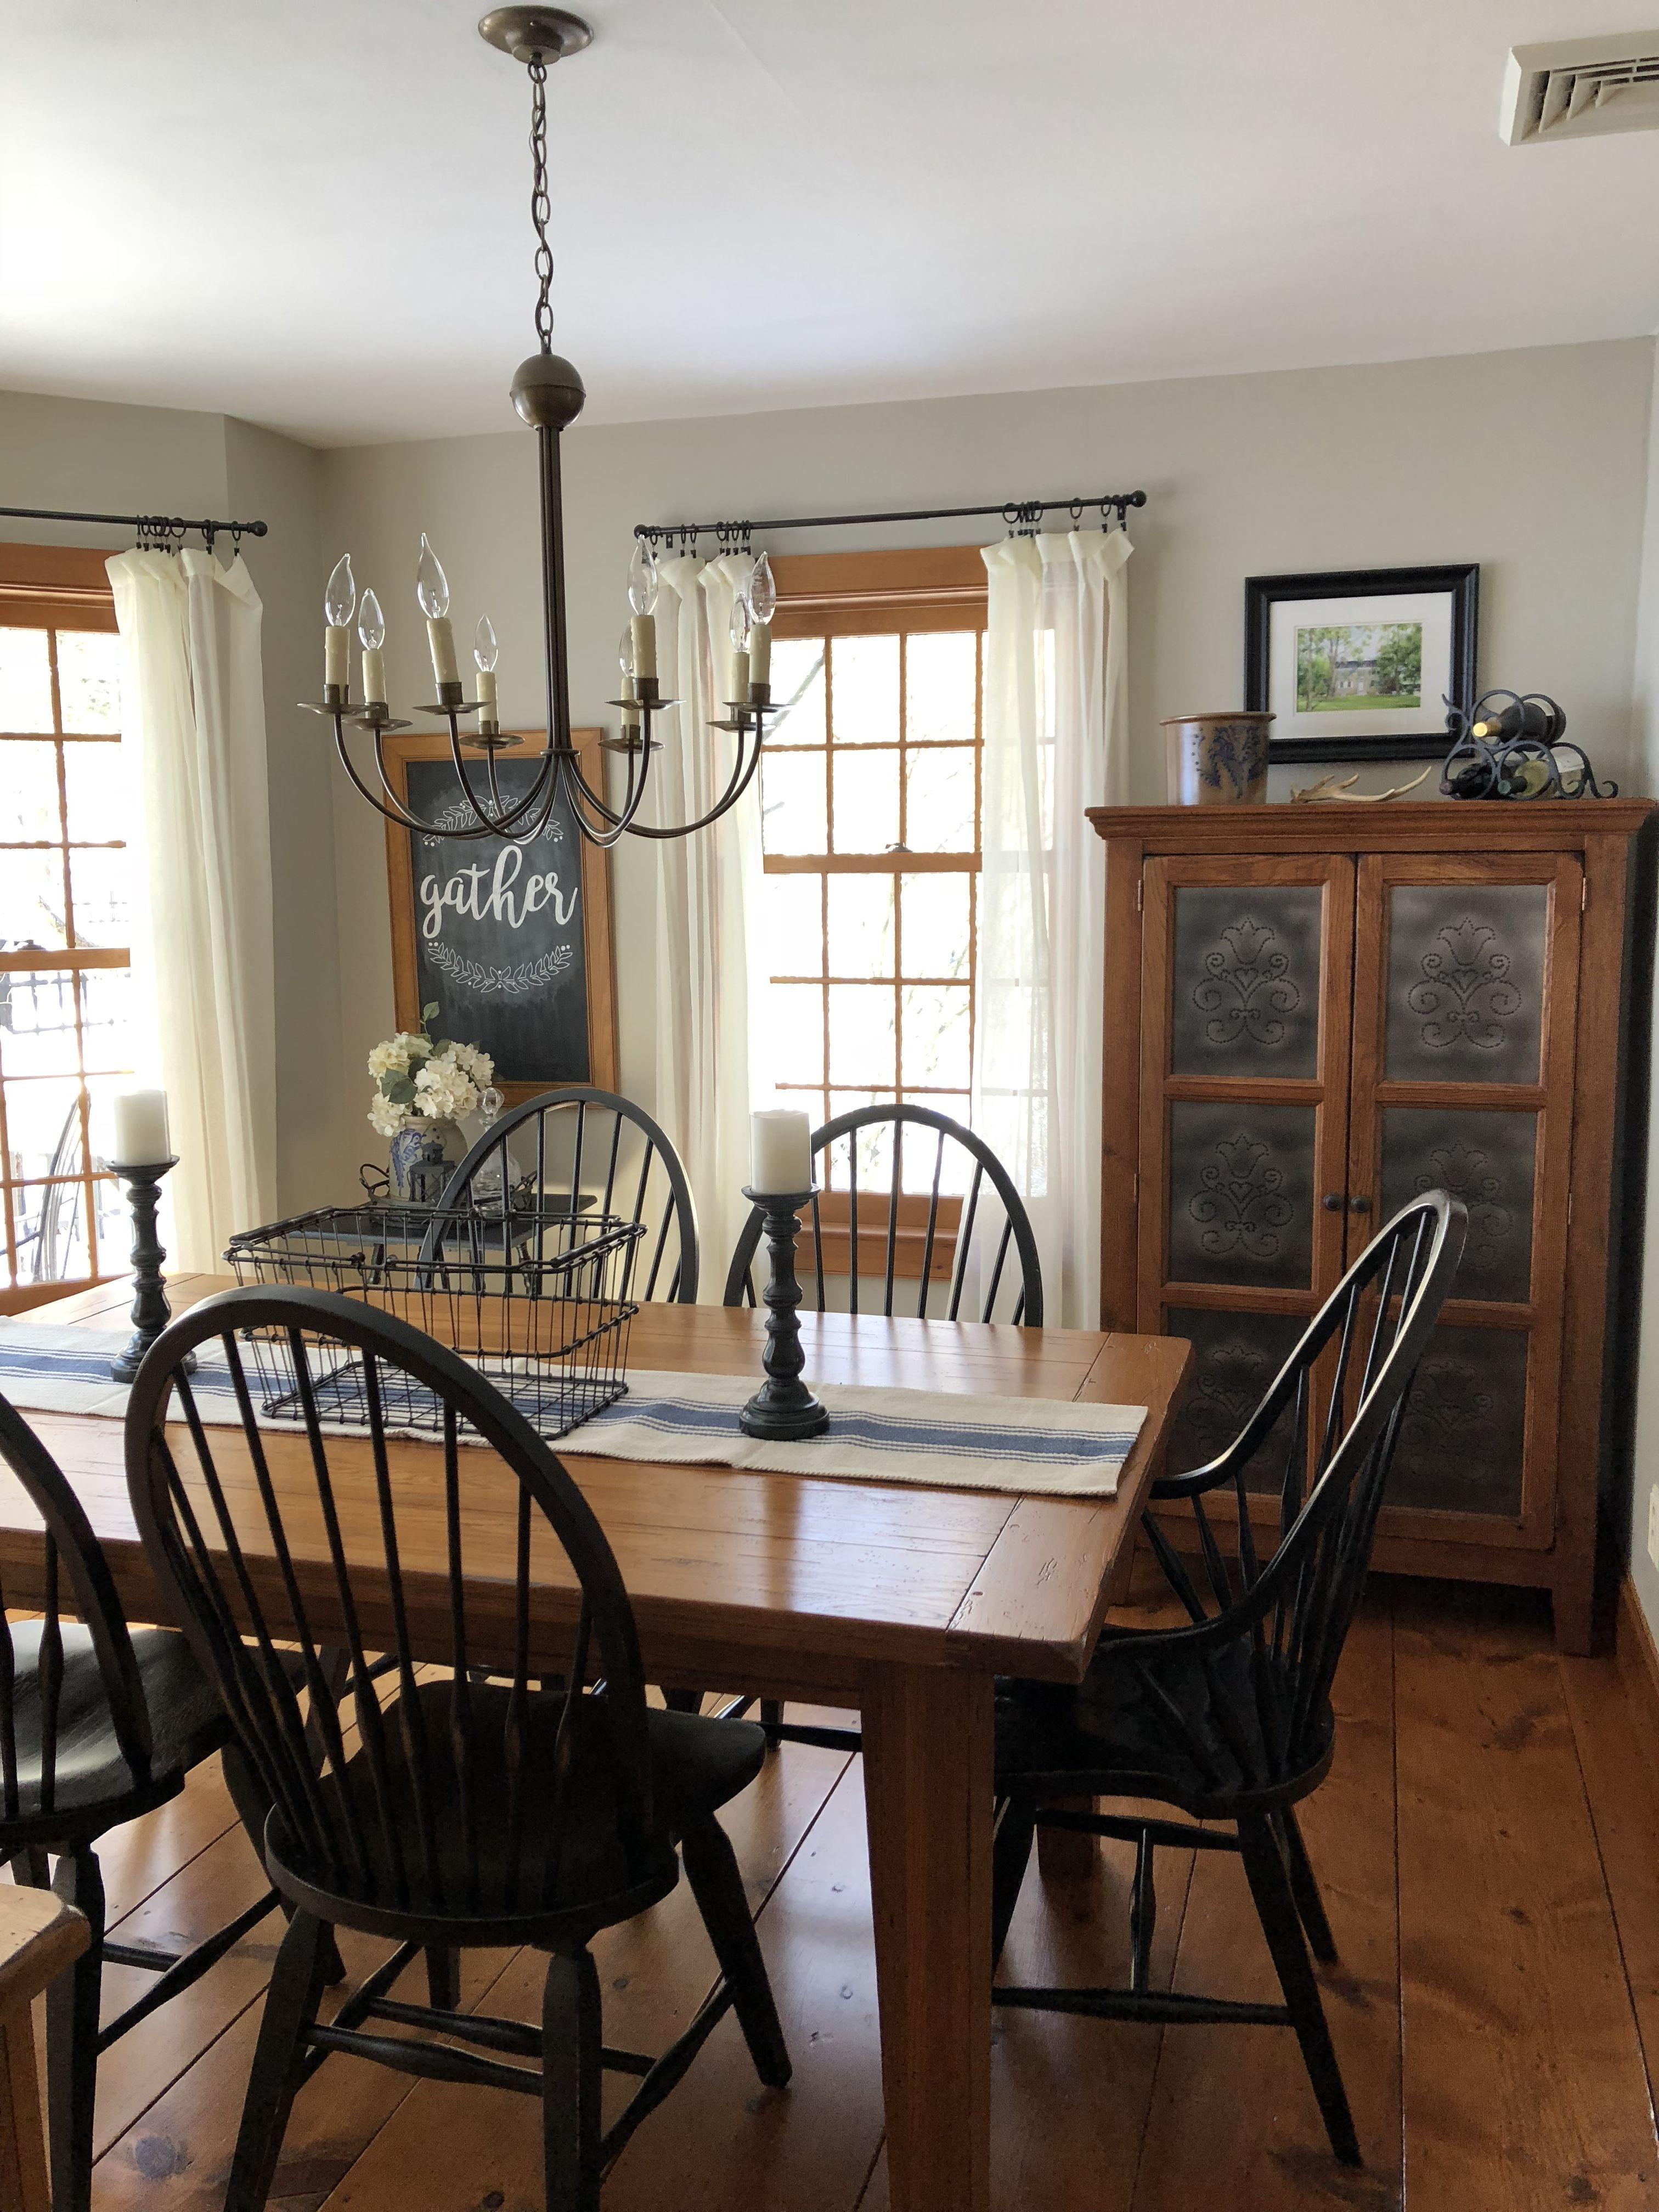 Benjamin Moore Revere Pewter The Best Gray For Wood Trim Farm House Living Room Farmhouse Dining Farmhouse Dining Room Table #revere #pewter #living #room #ideas